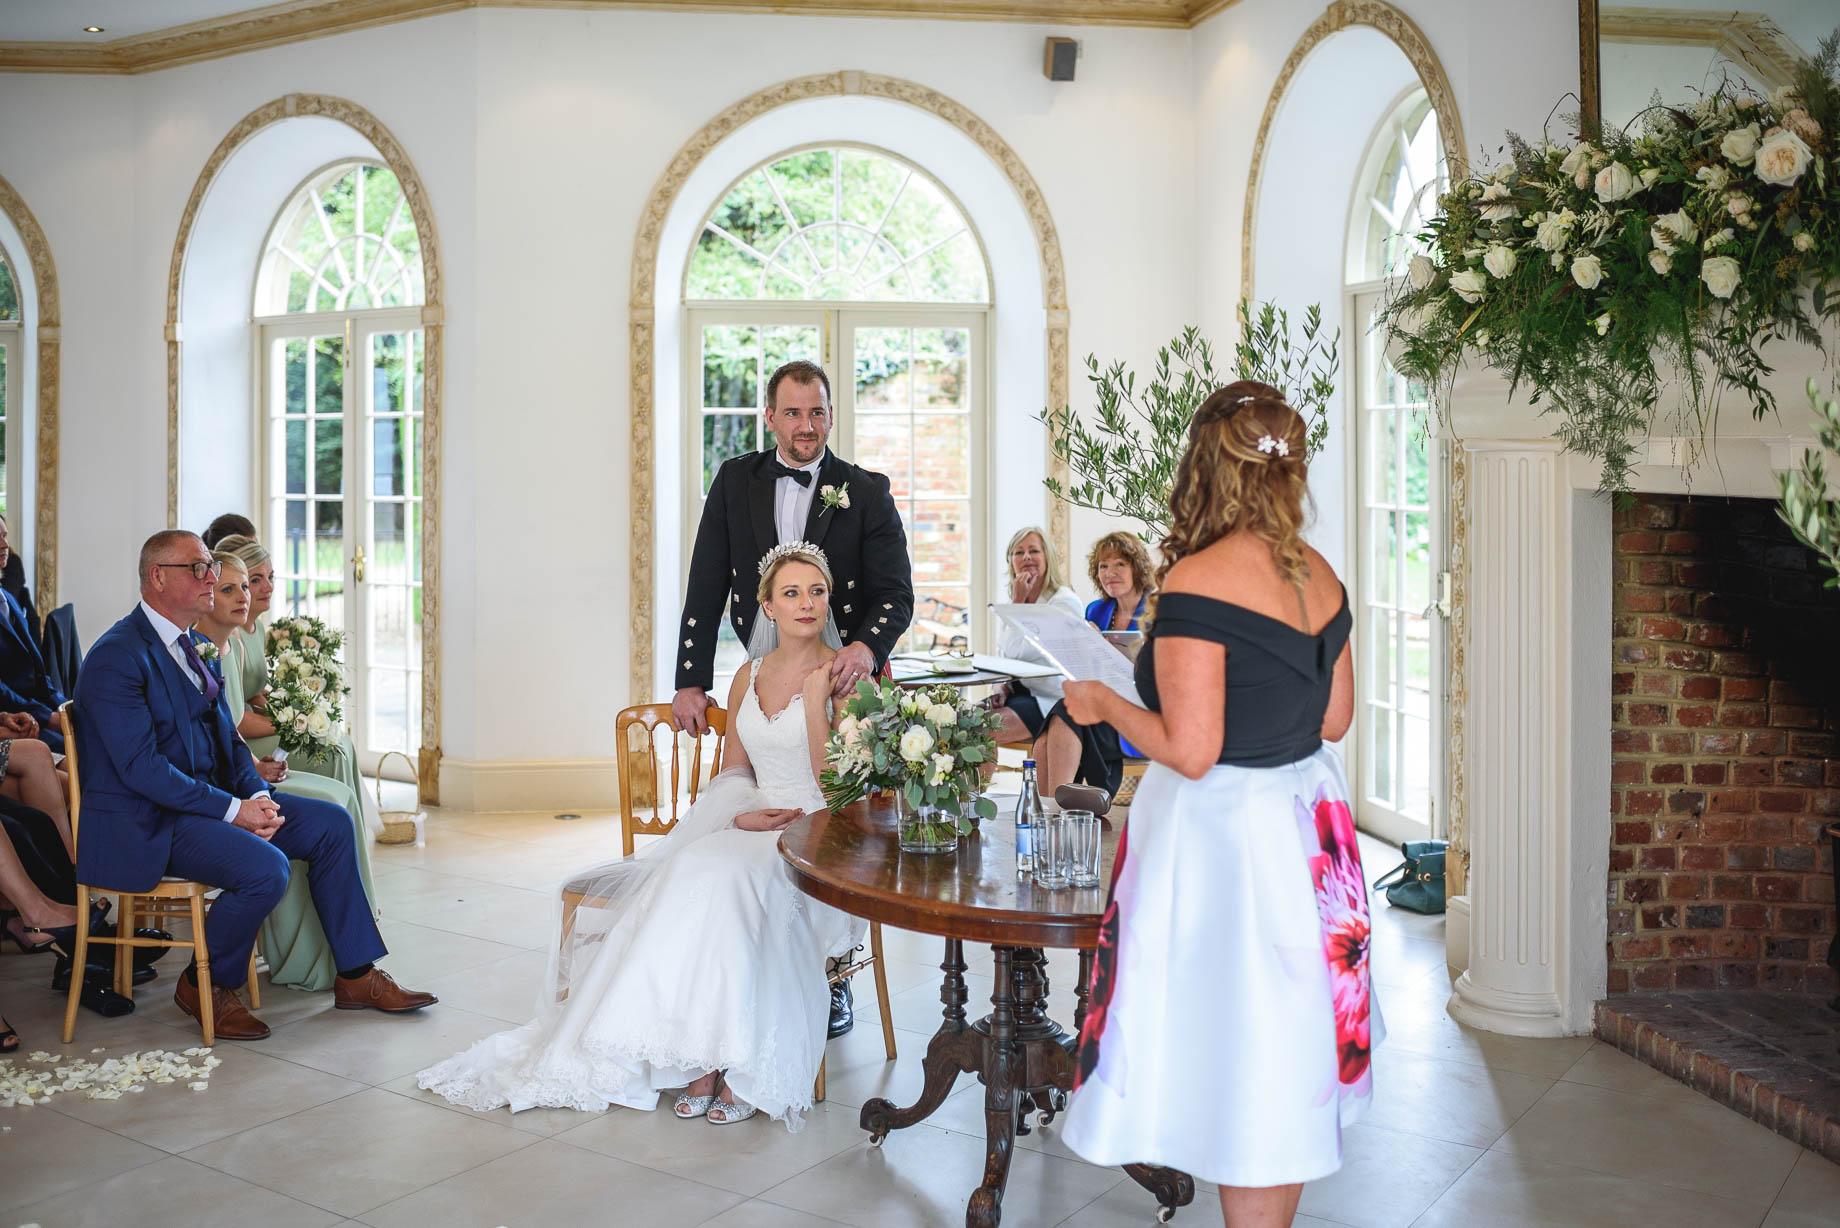 Northbrook Park wedding photography - Natalie + Andrew